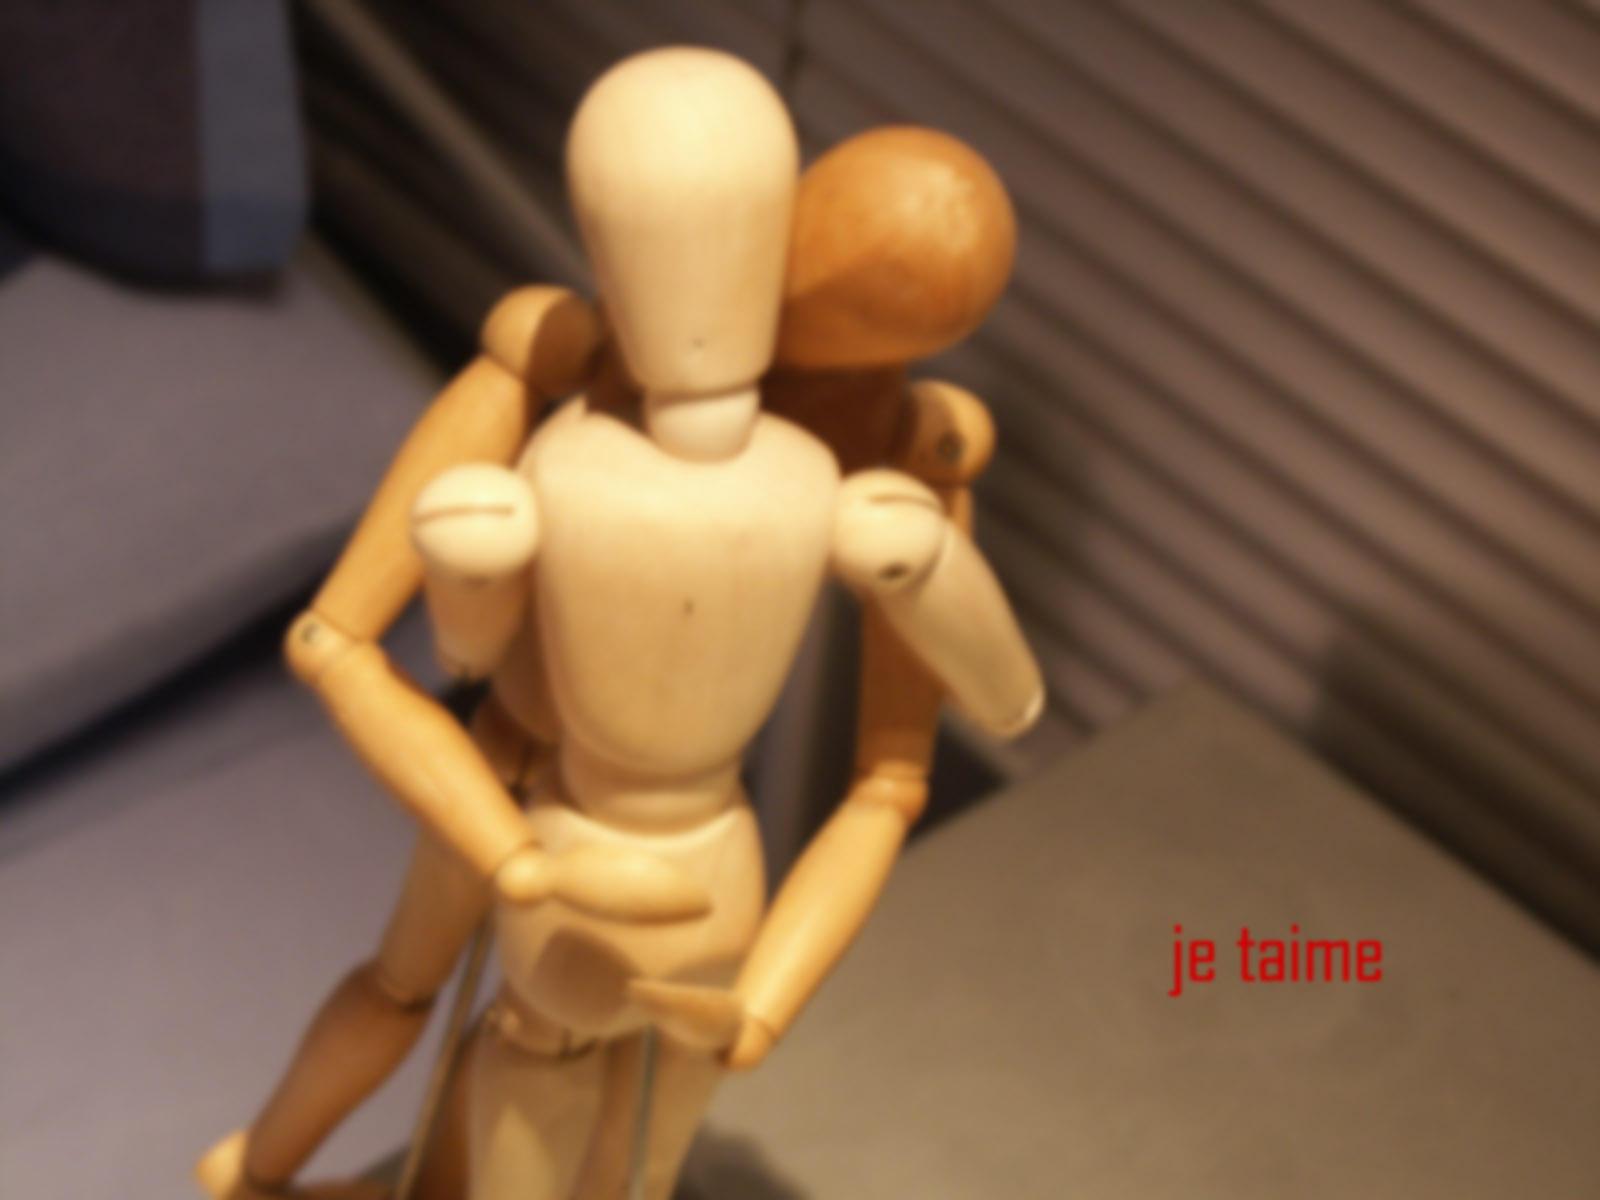 Image du moment je_taime